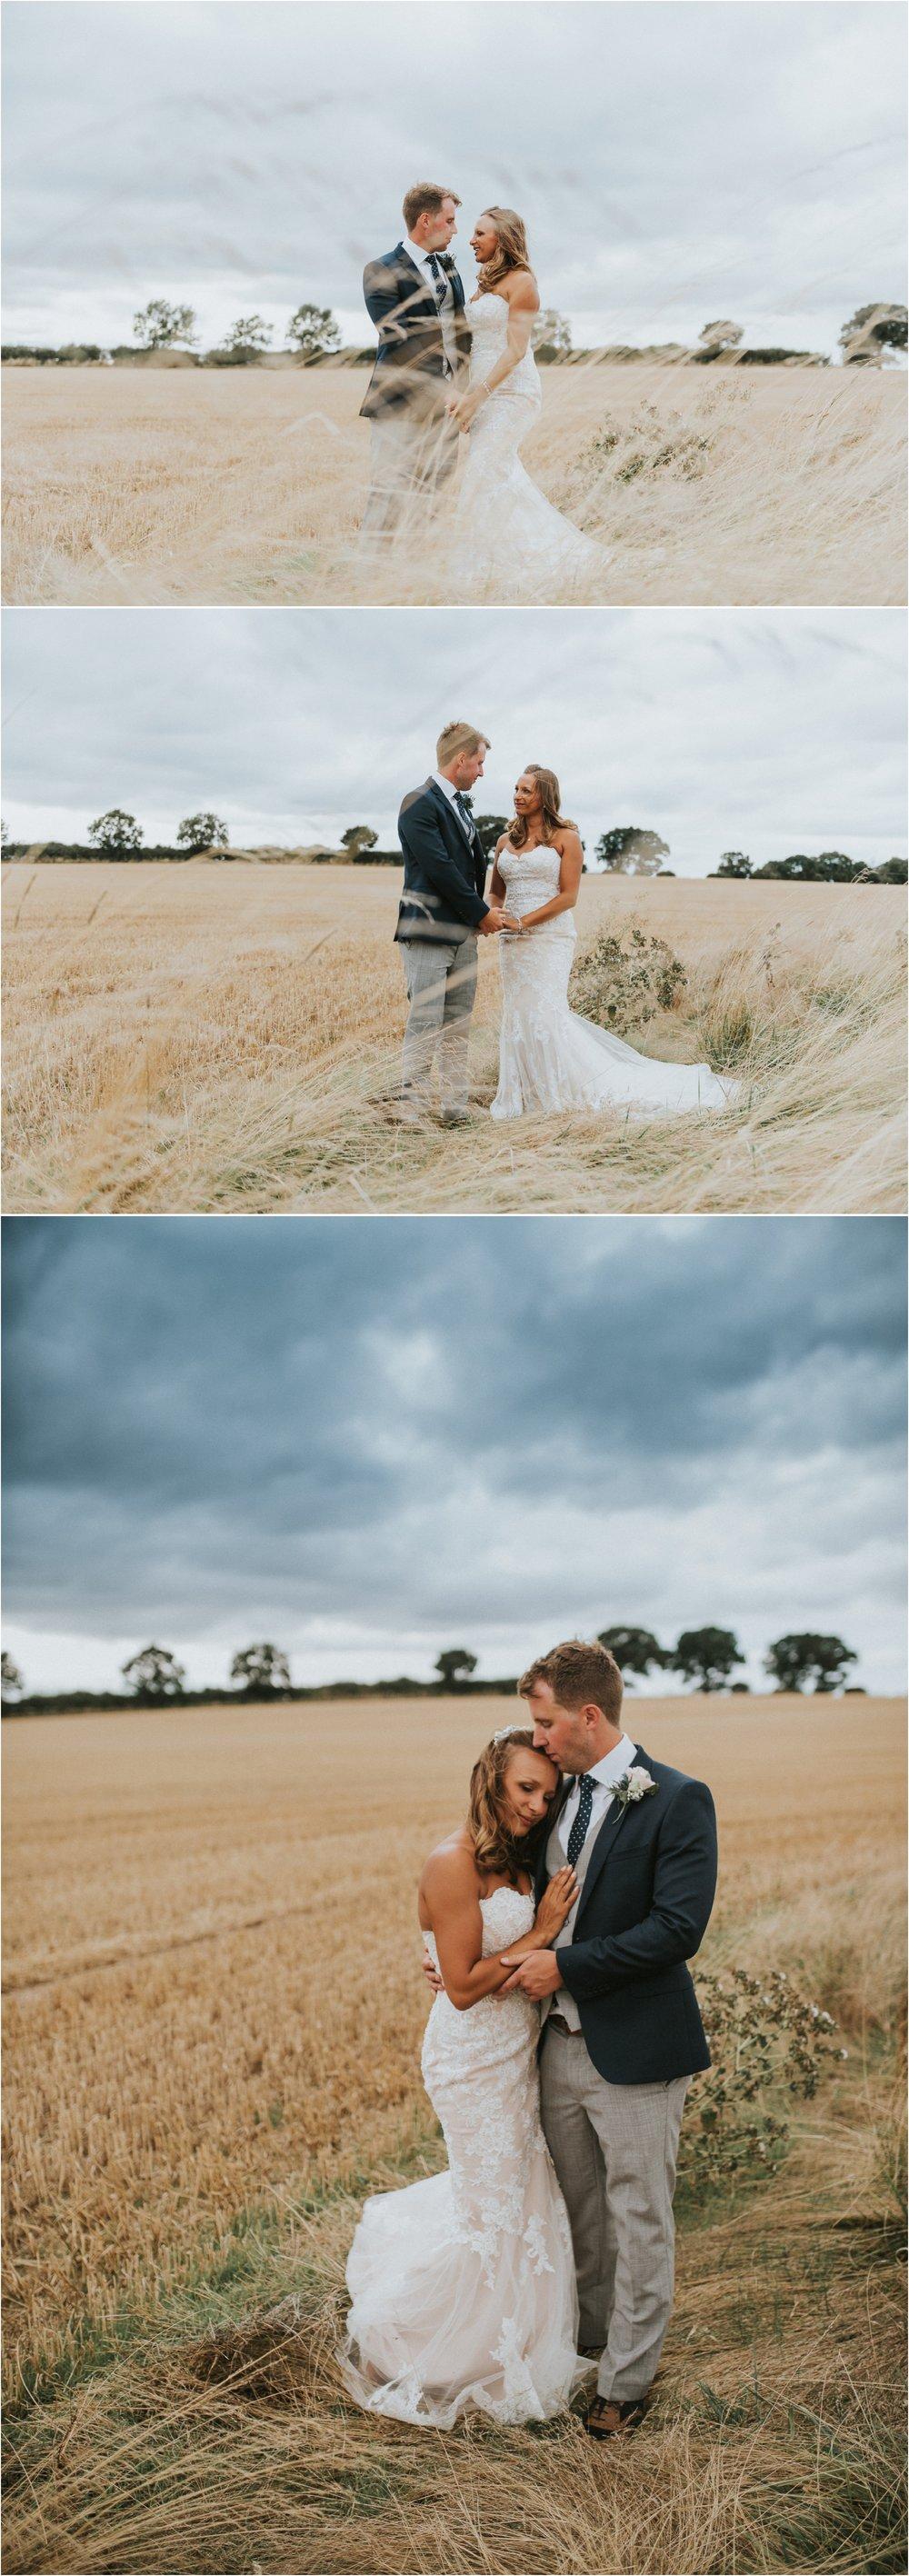 PheasantBrewery-LukeHolroyd-Yorkshirewedding_000193.jpg